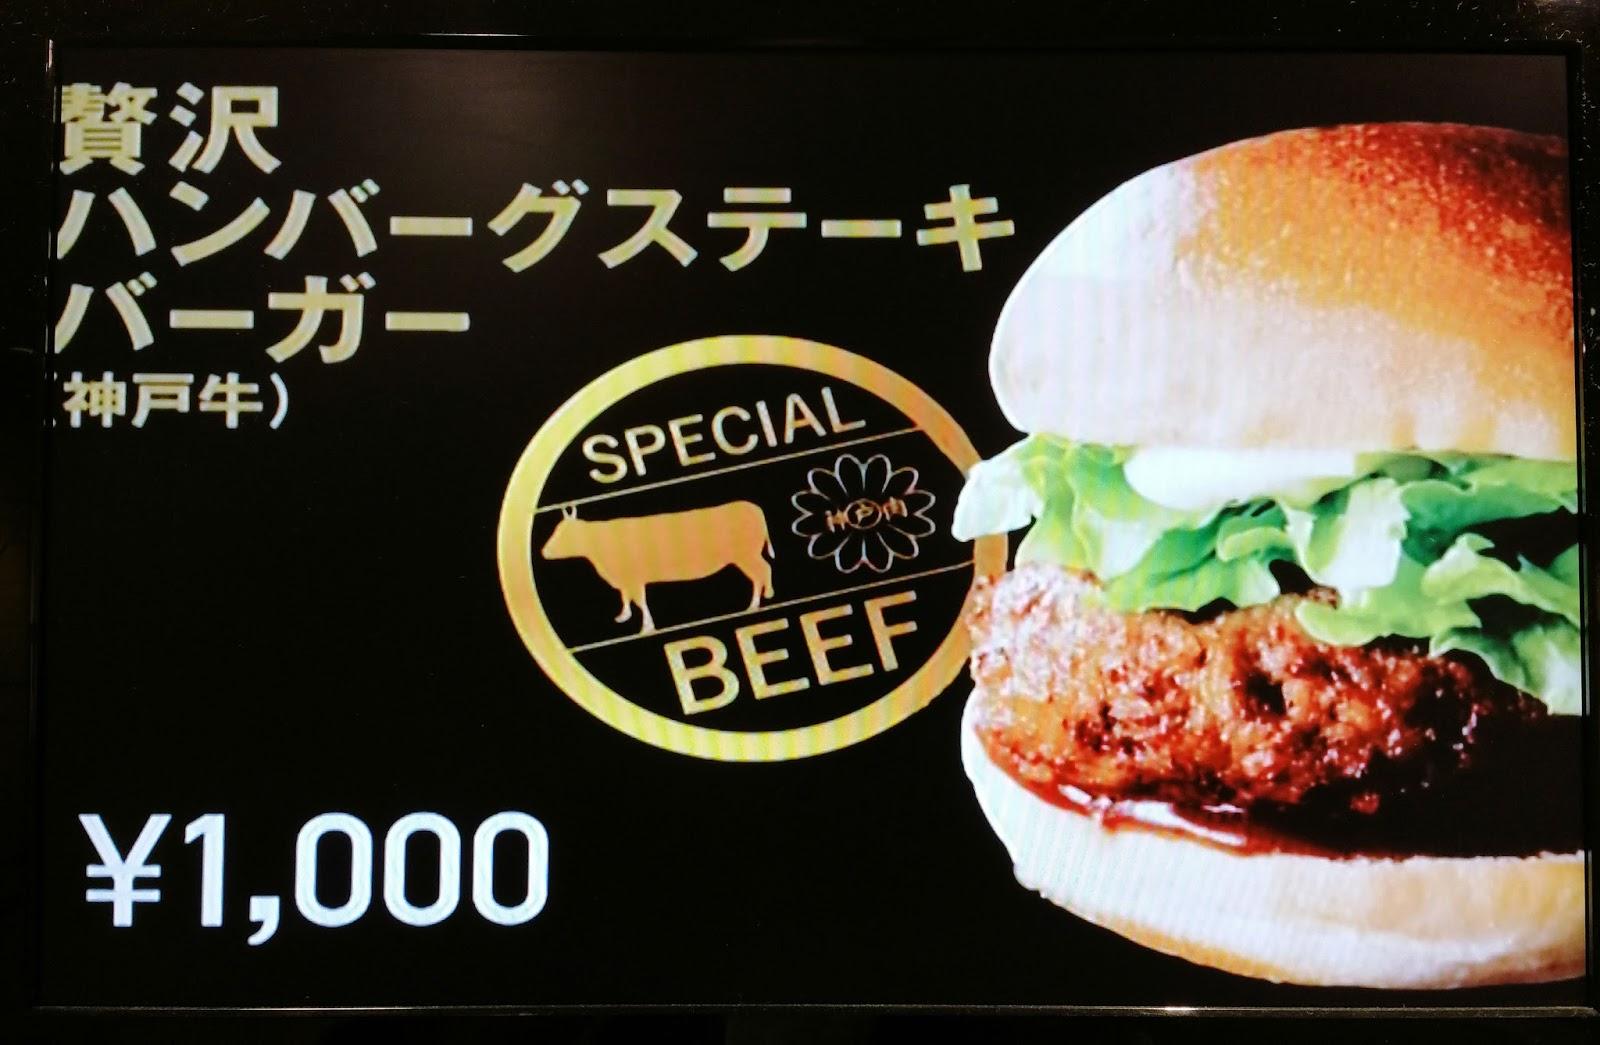 Food Science Japan 201609 Lotteria Chicken Burger Set Kobe Beef